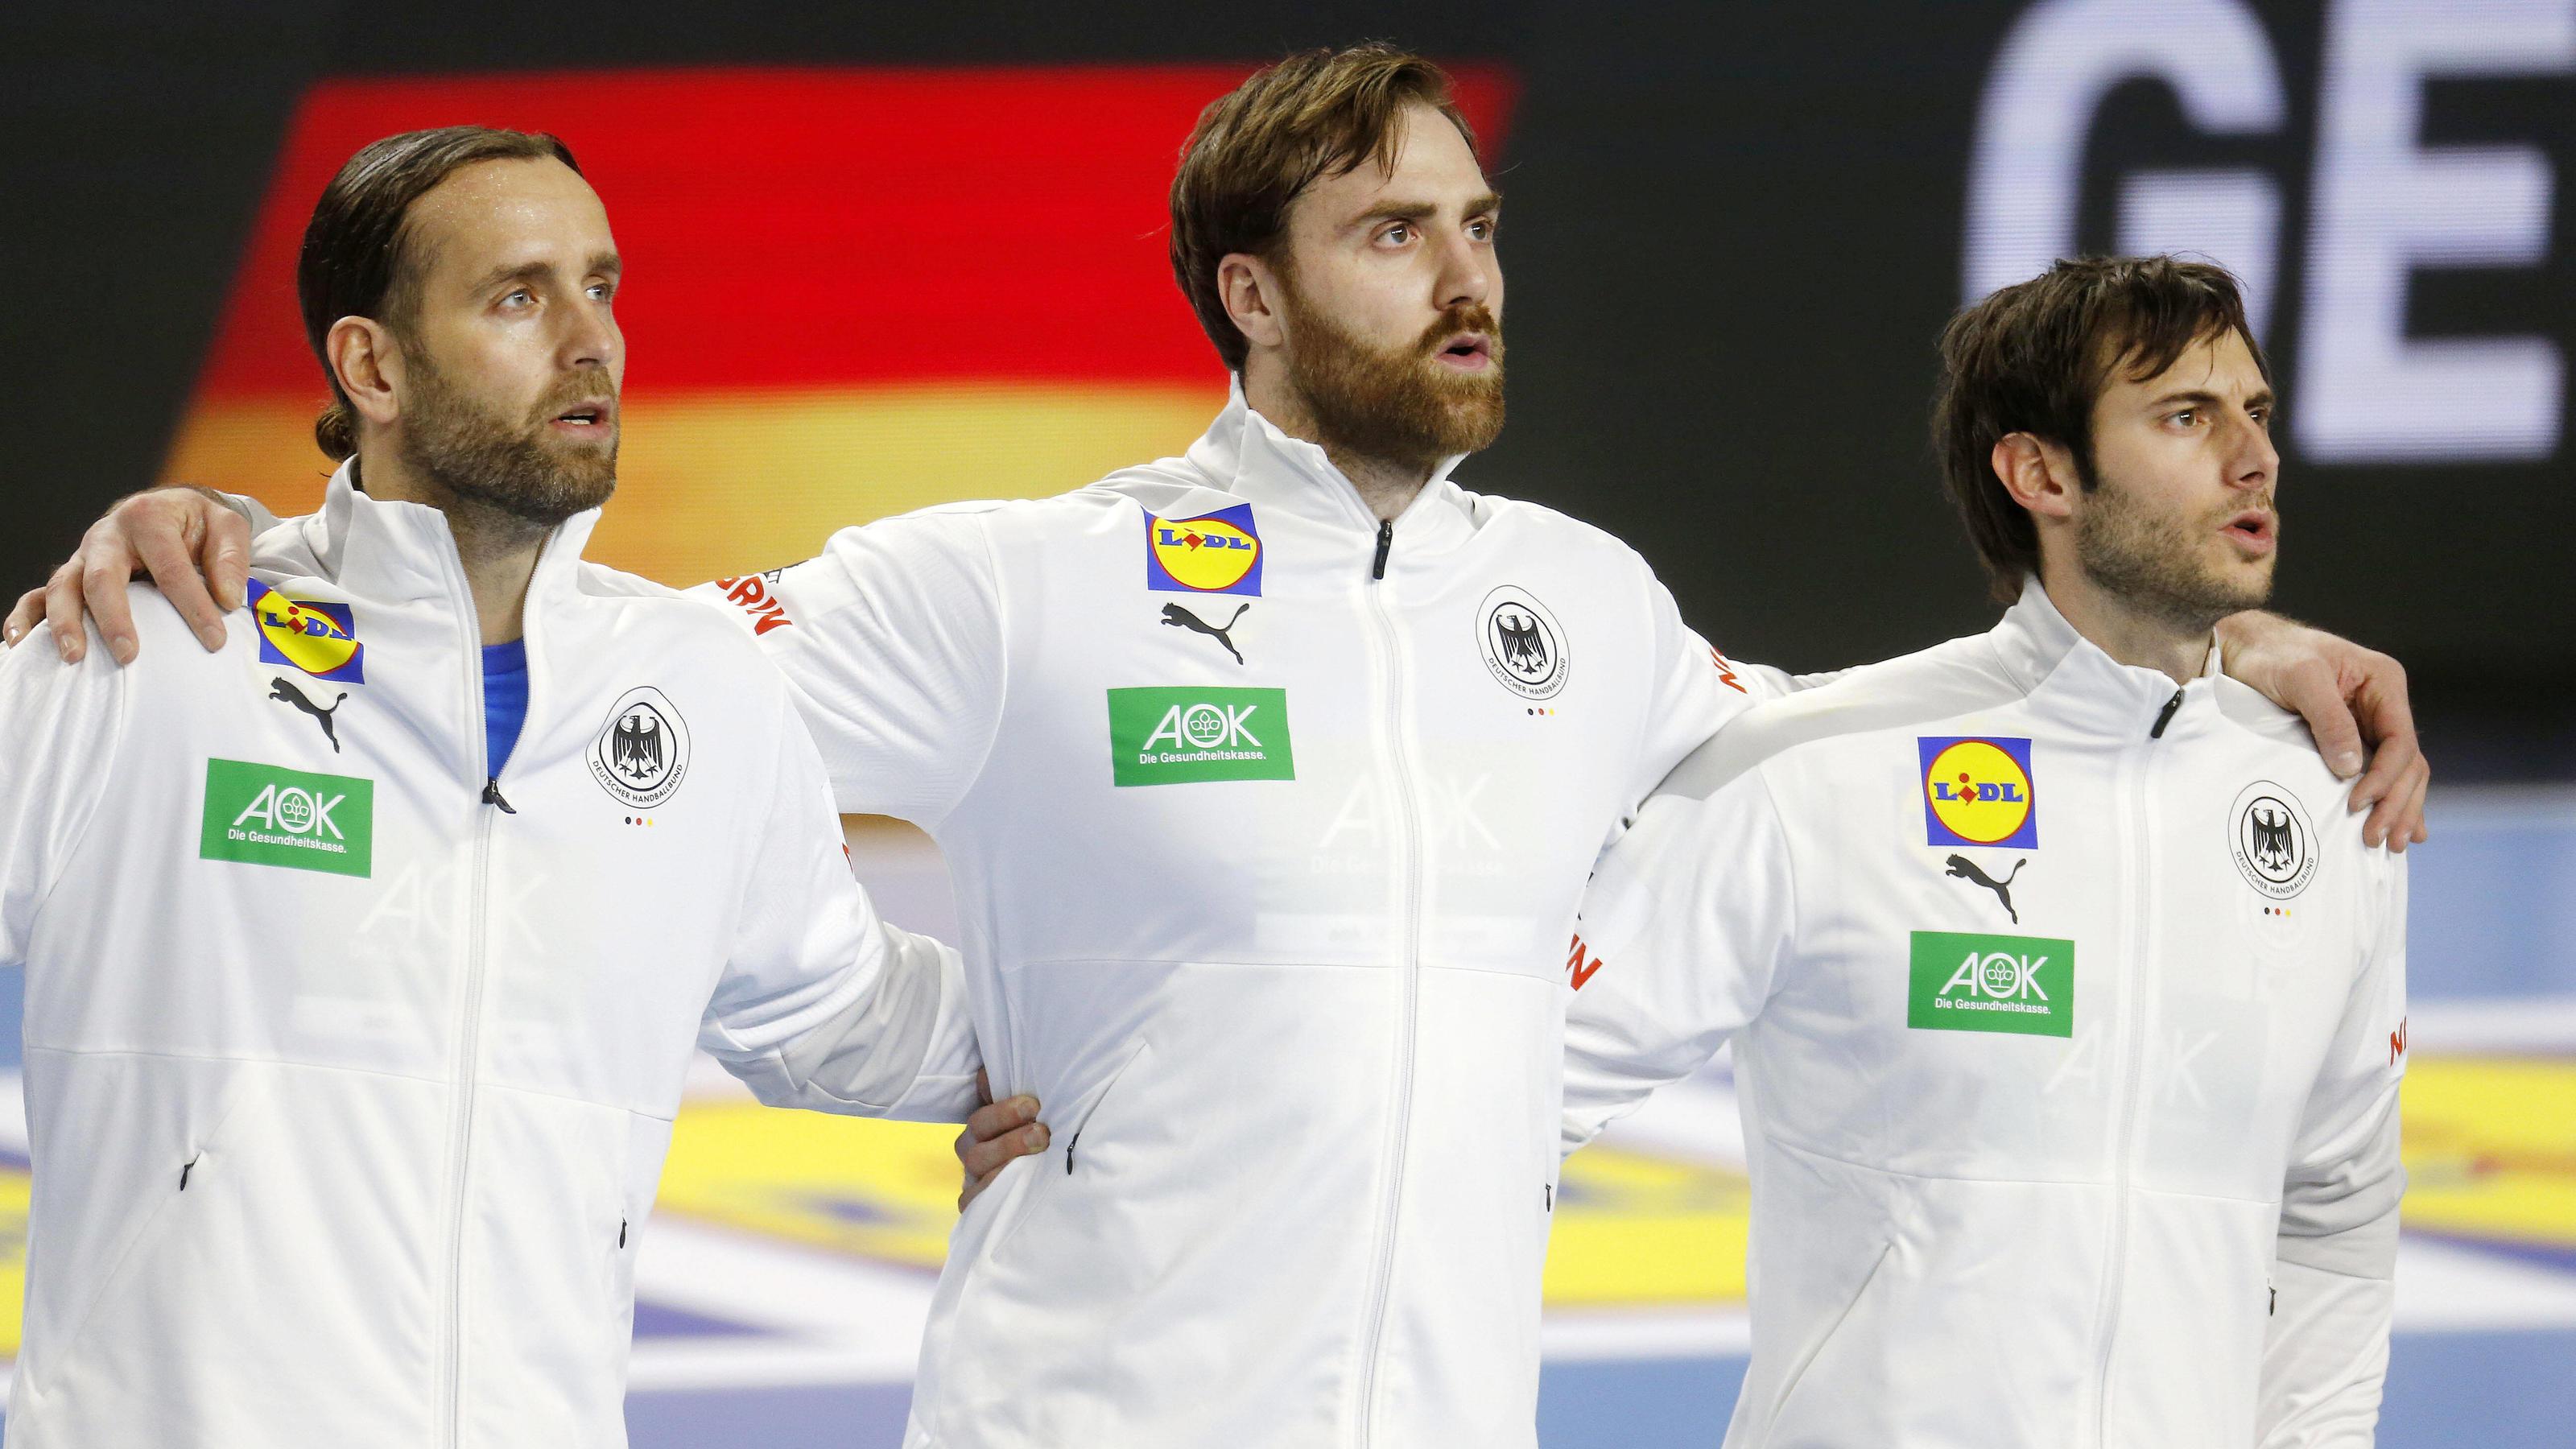 Sie Handball